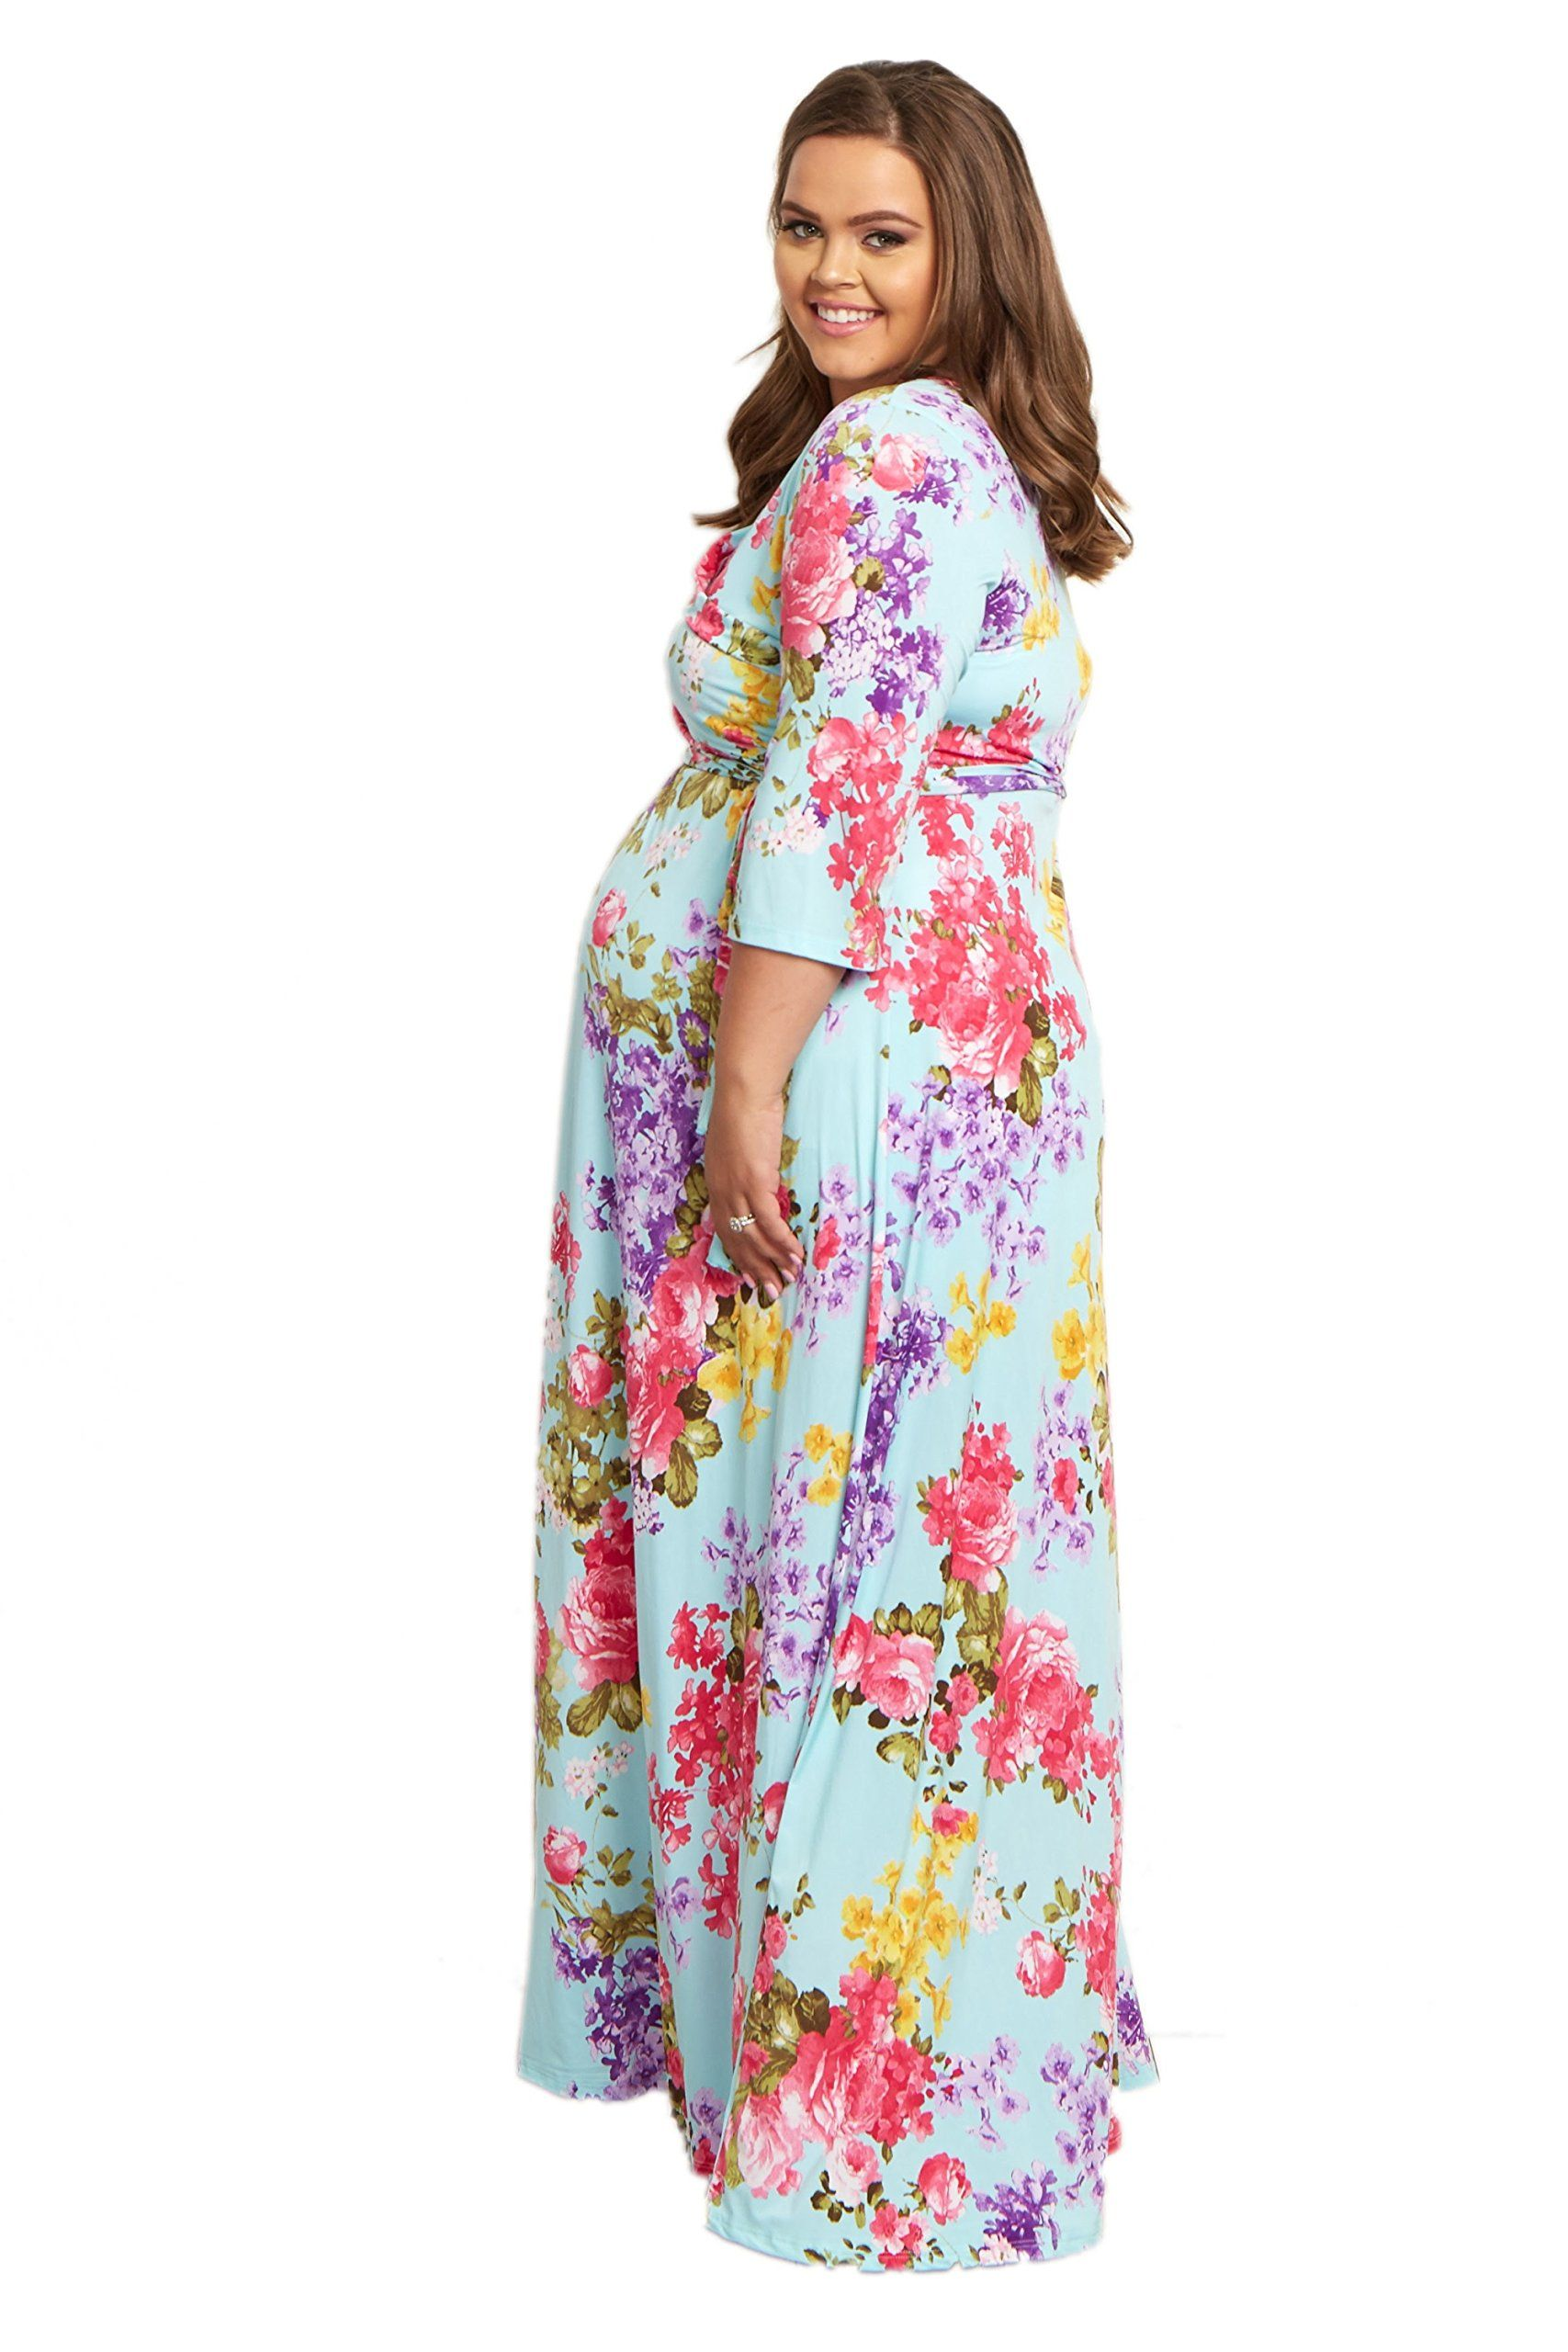 99f2fc374f35f Maternity Fashion - hard-wearing maternity maxi dress : PinkBlush Maternity  Light Blue Floral Sash Tie Plus Size Maxi Dress 1X ** Details could be ...